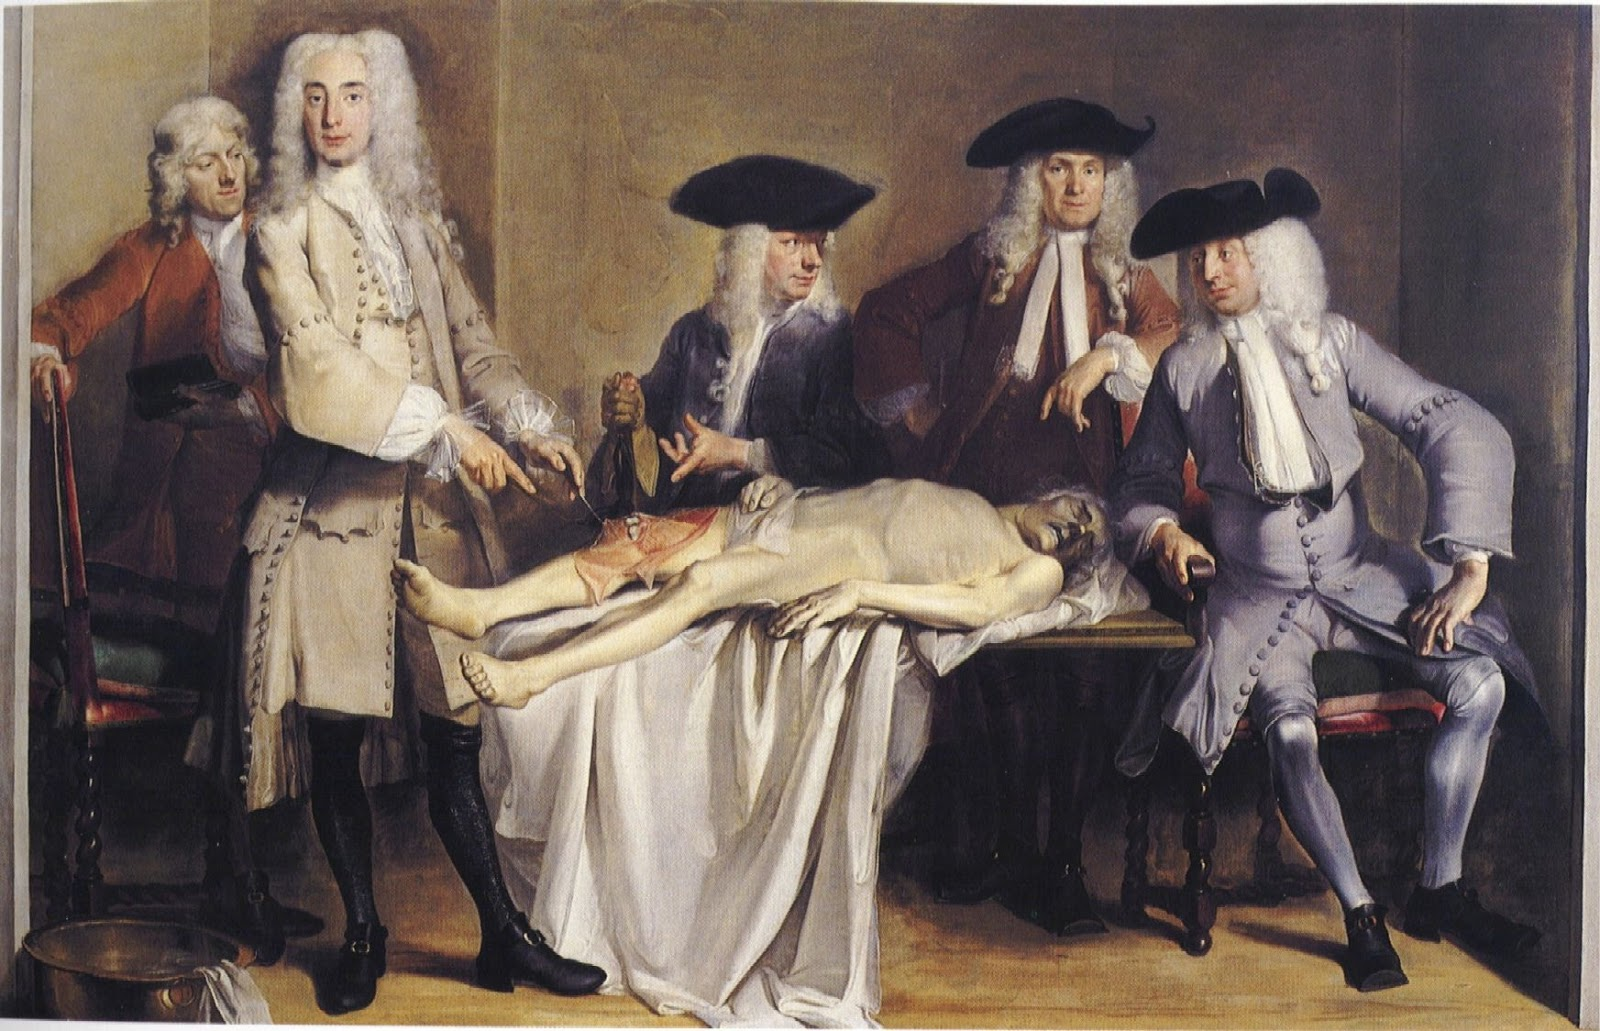 Historia de la anatomia | Anatomia